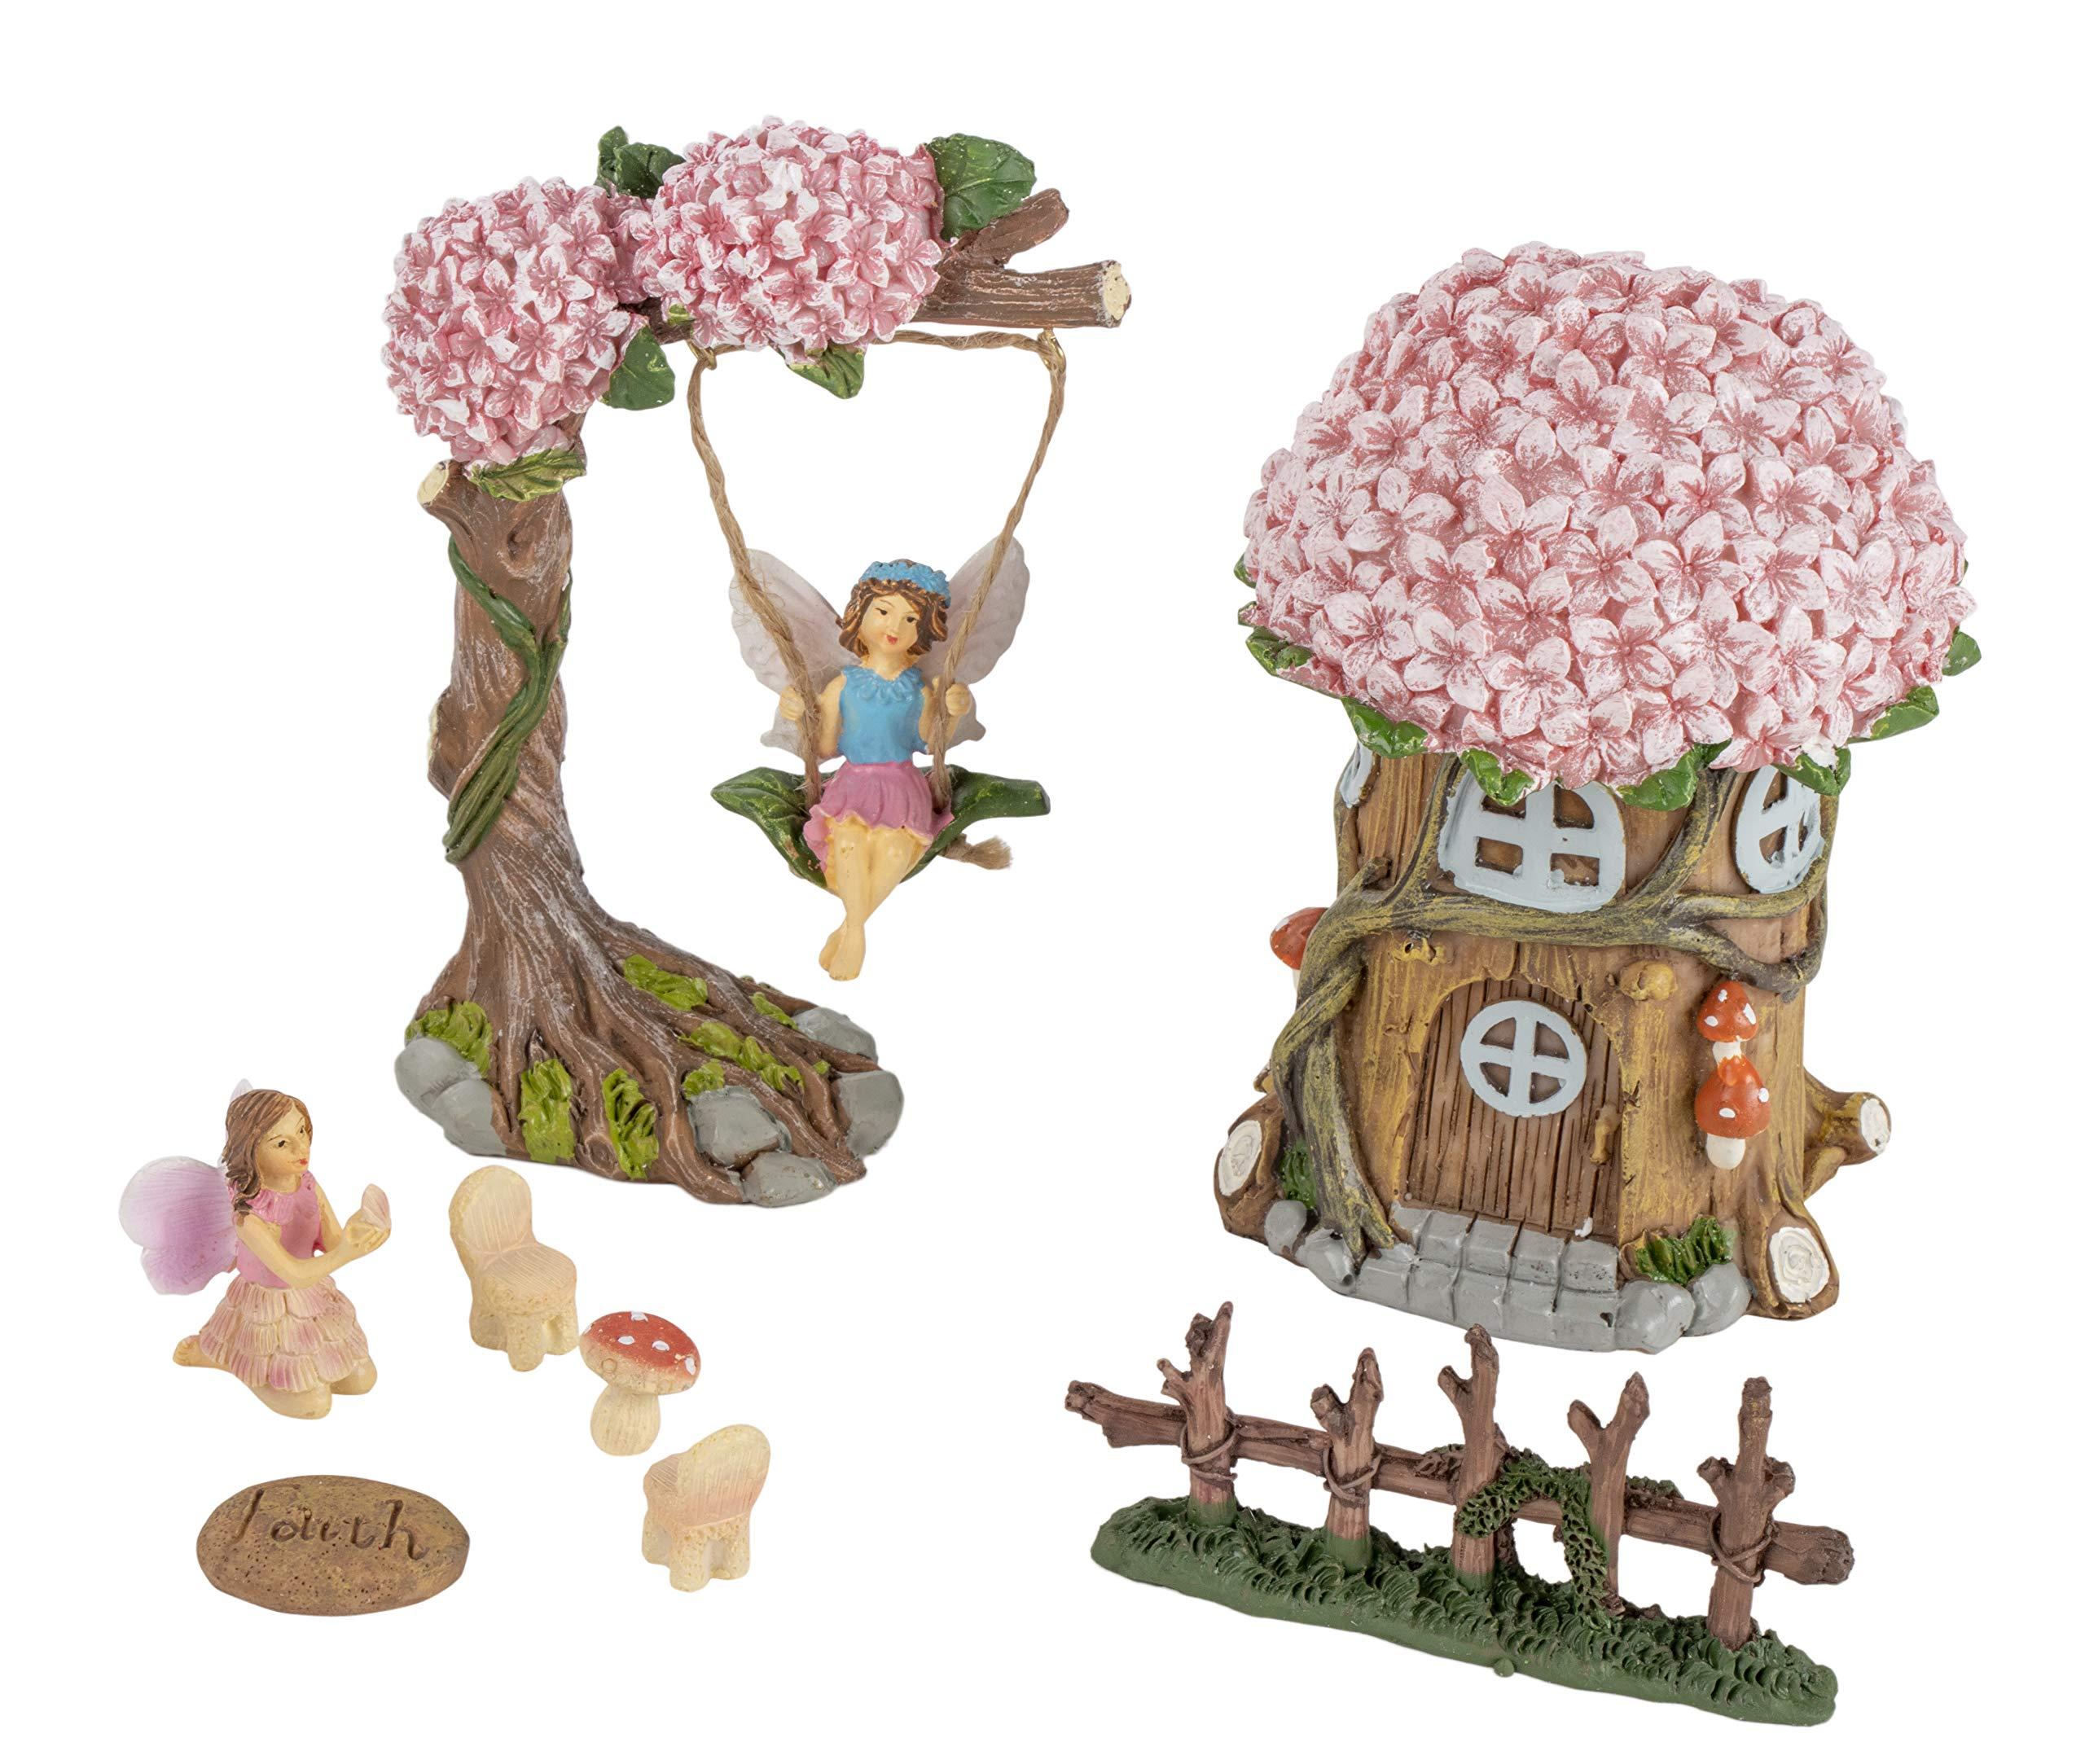 Juvale Fairy Garden Kit - 8-Piece Miniature Tree House and Fairy Figurines, Mini Fairy Garden Accessories, Indoor Outdoor Decorations, Yard, Lawn, Housewarming, Wedding Gift